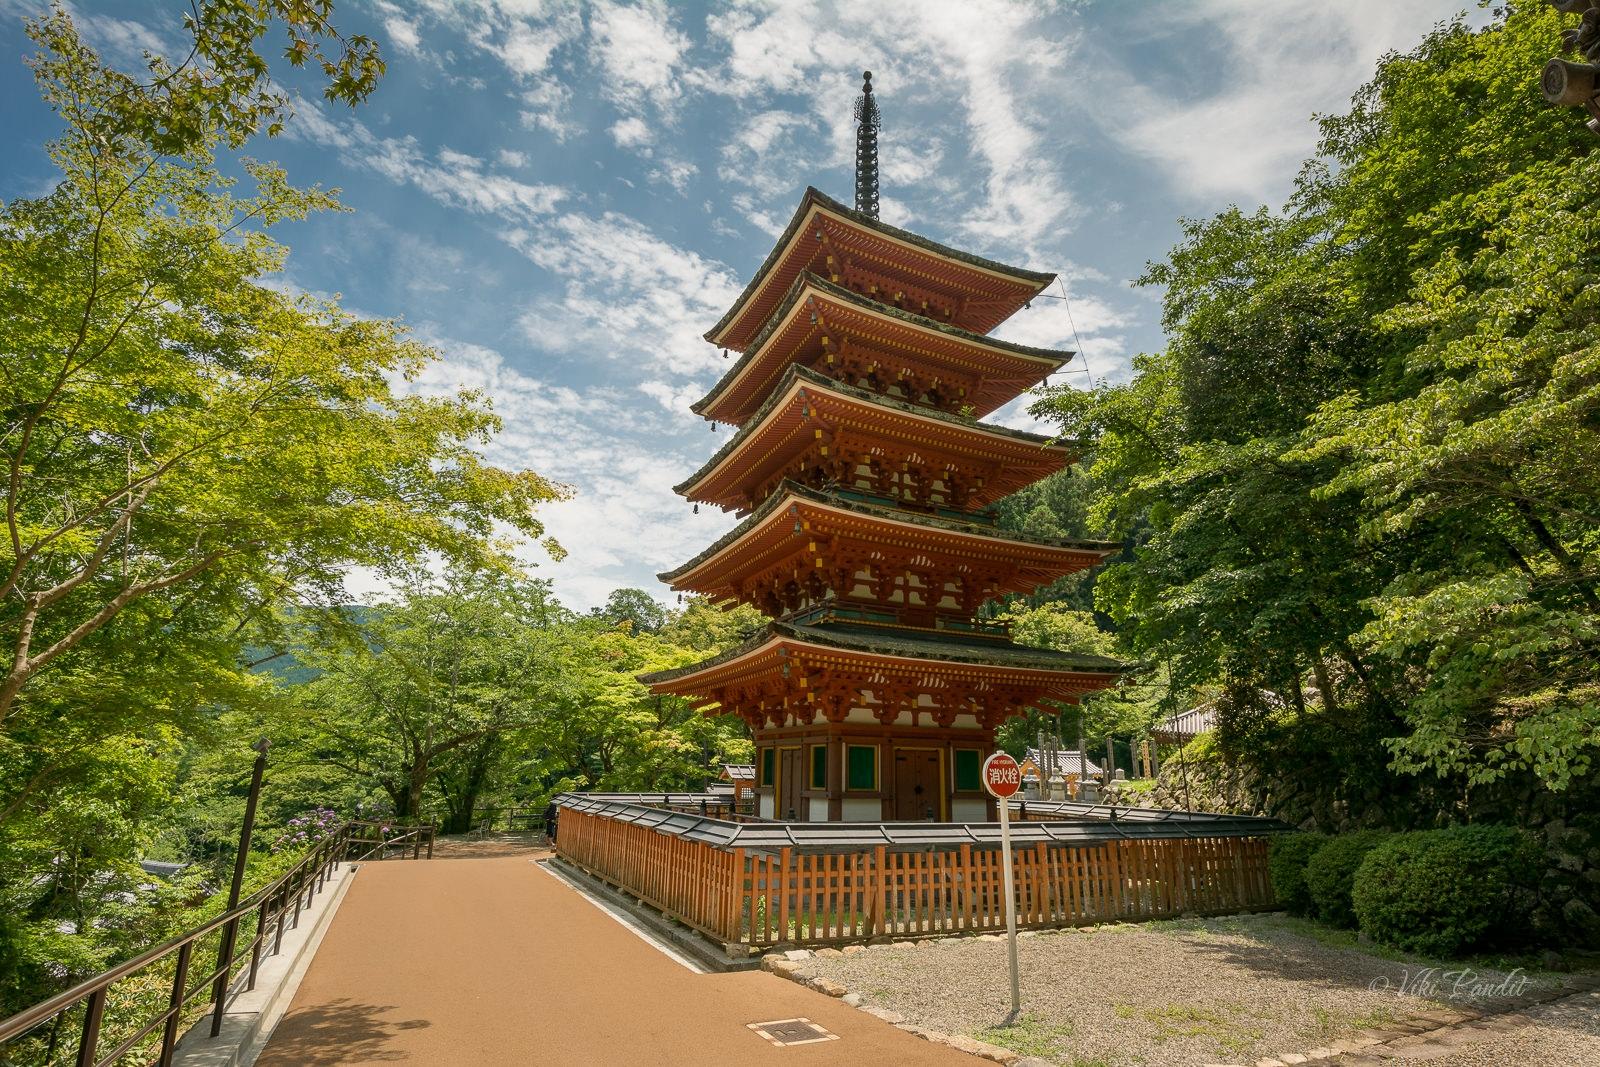 Showa Pagoda, Hasedera, Nara